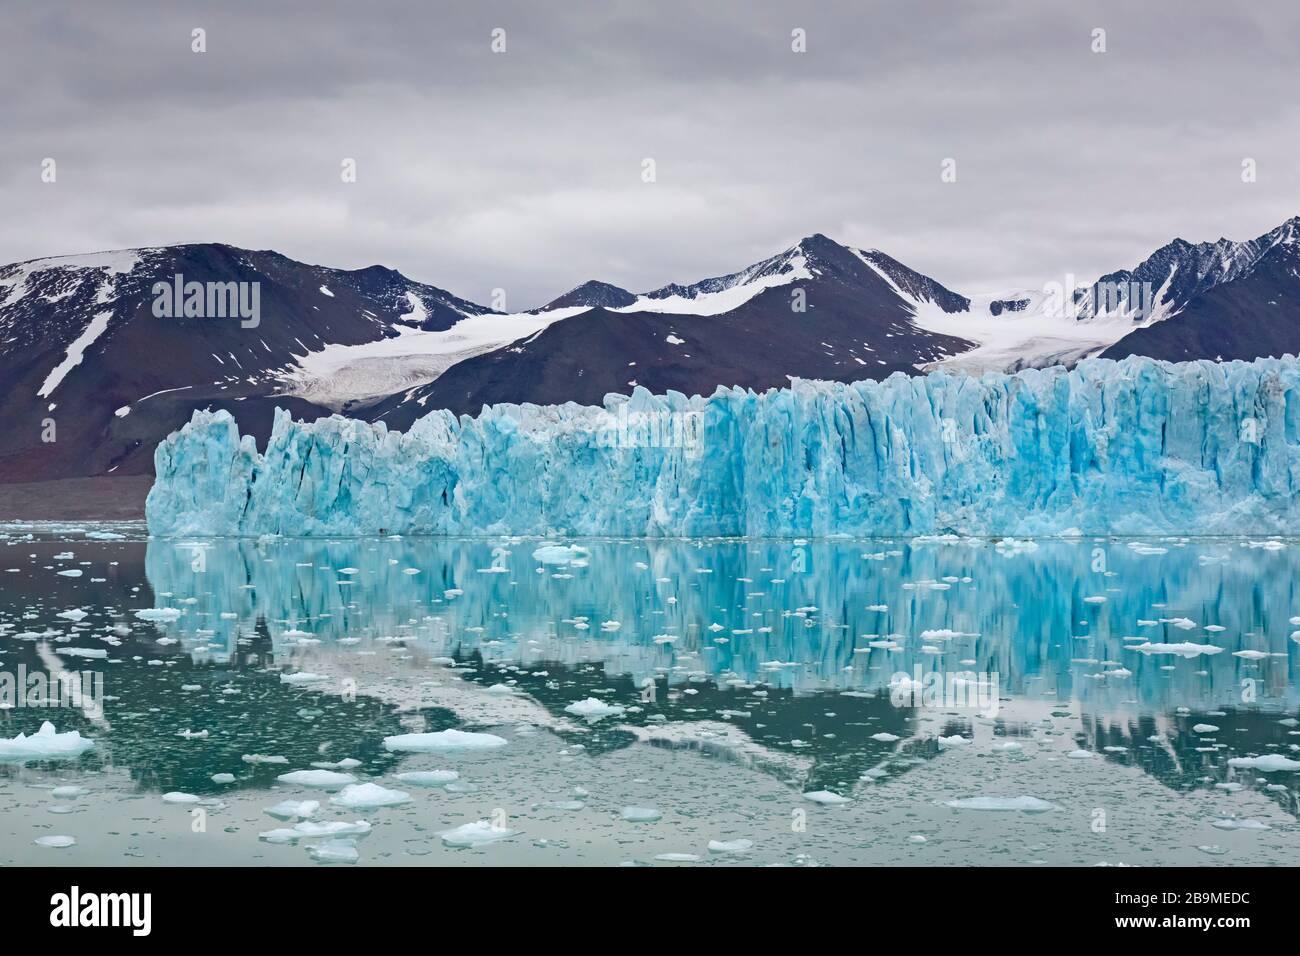 Monacobreen, glacier in Haakon VII Land which debouches into Liefdefjorden, Spitsbergen / Svalbard, Norway Stock Photo